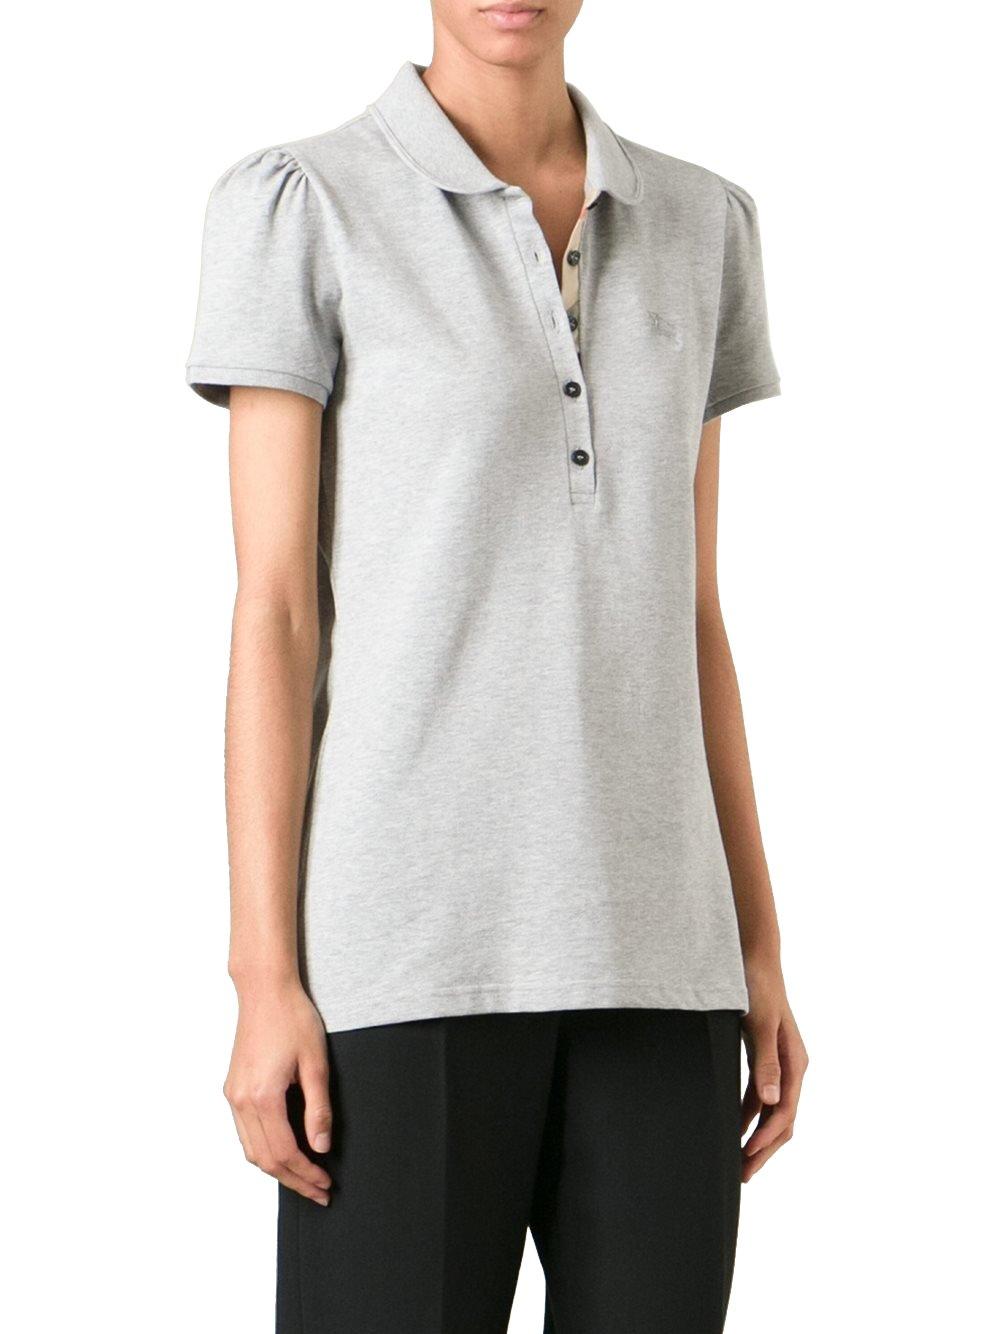 BURBERRY - Women's Polo YSM70254 - Grey (Pale Grey Melange), S